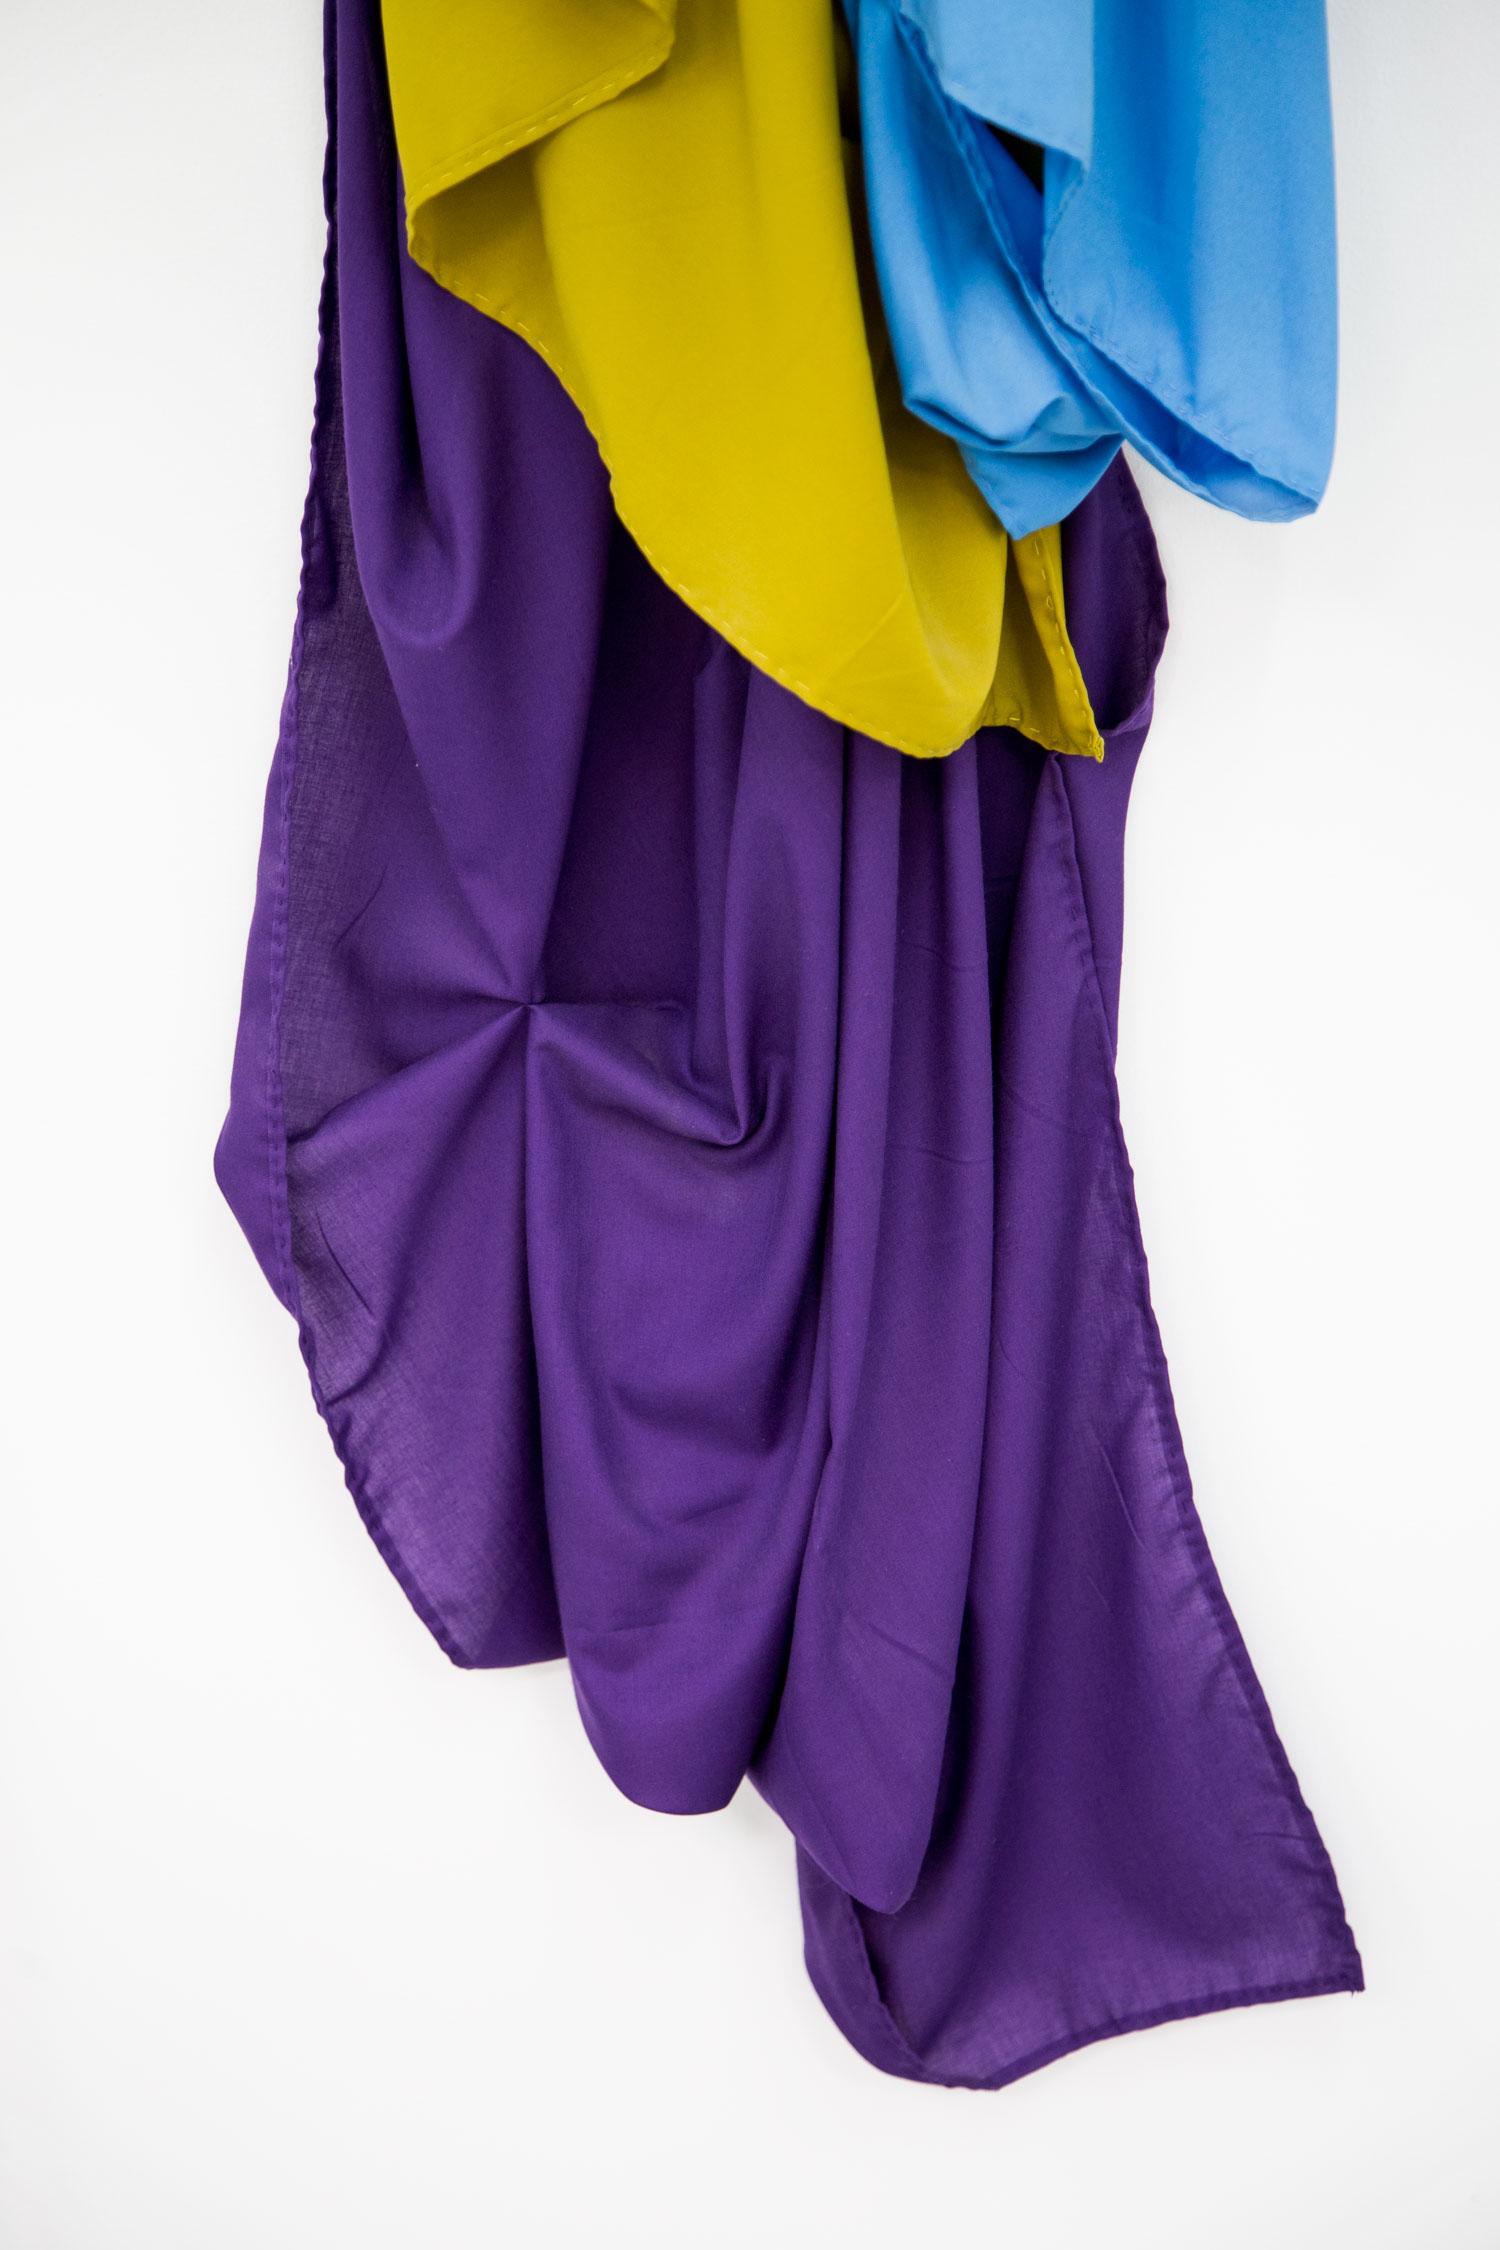 Female-Fabric.jpg